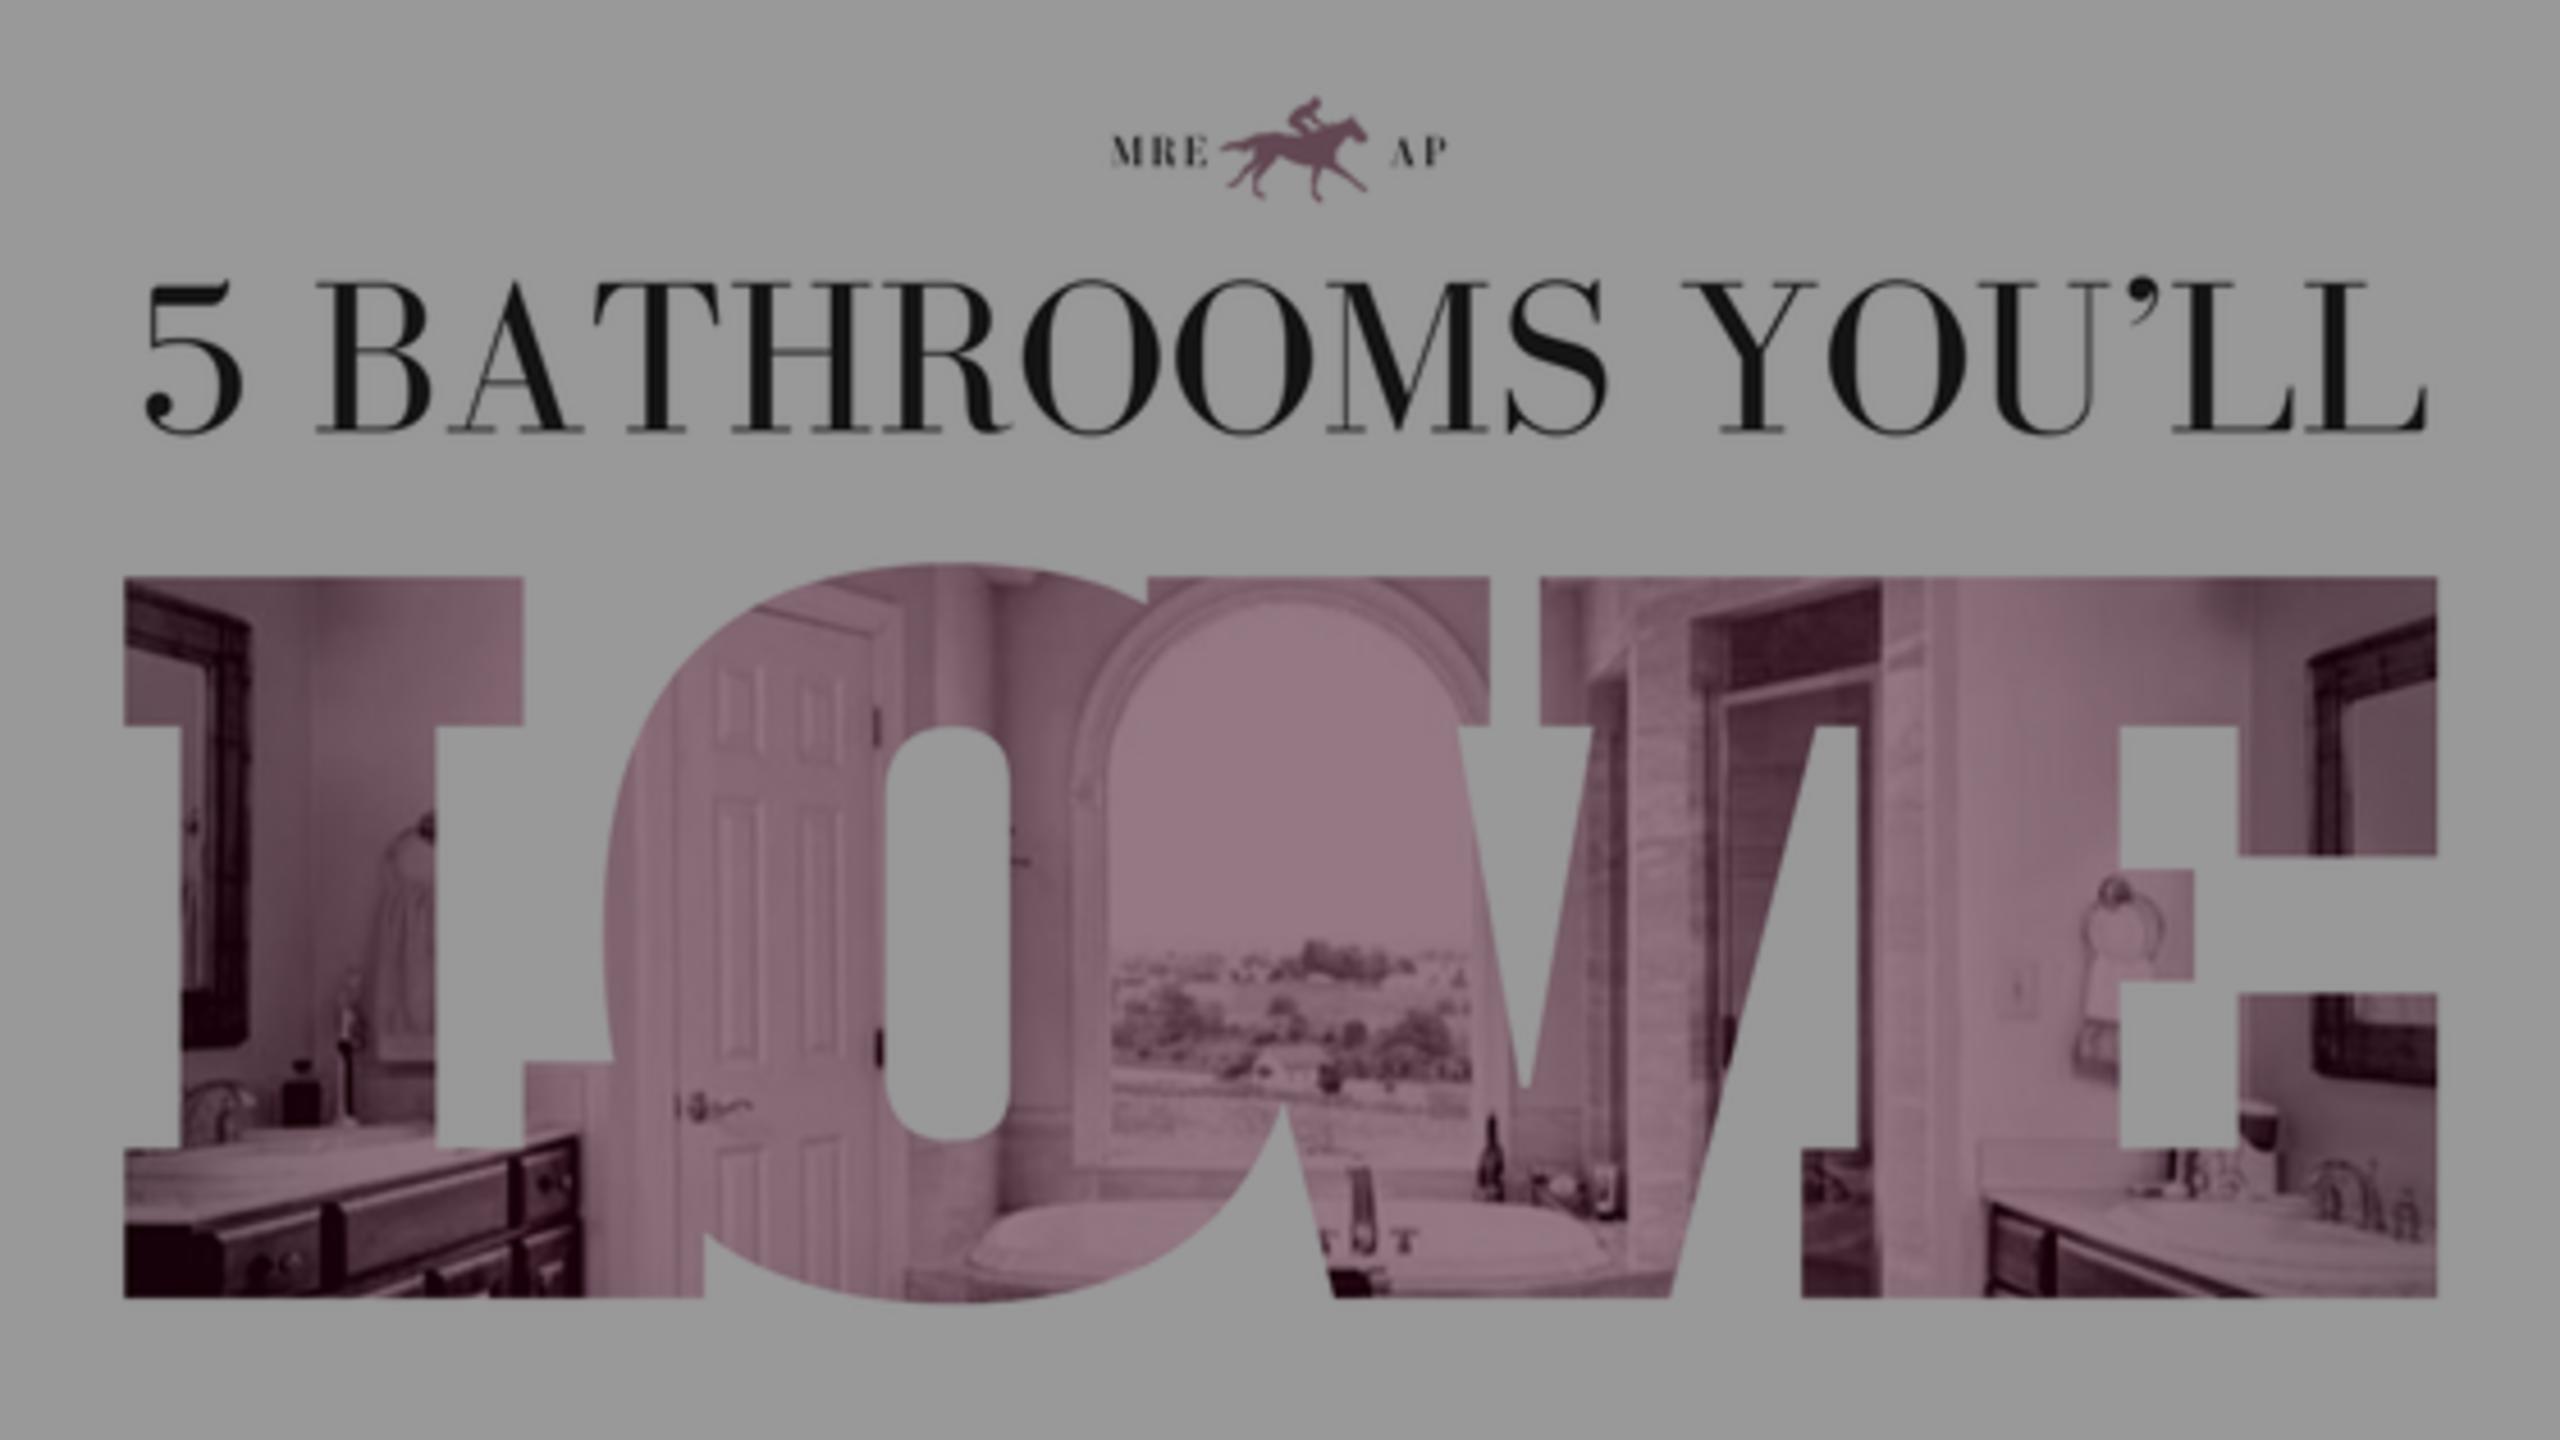 5 Bathrooms You'll Love